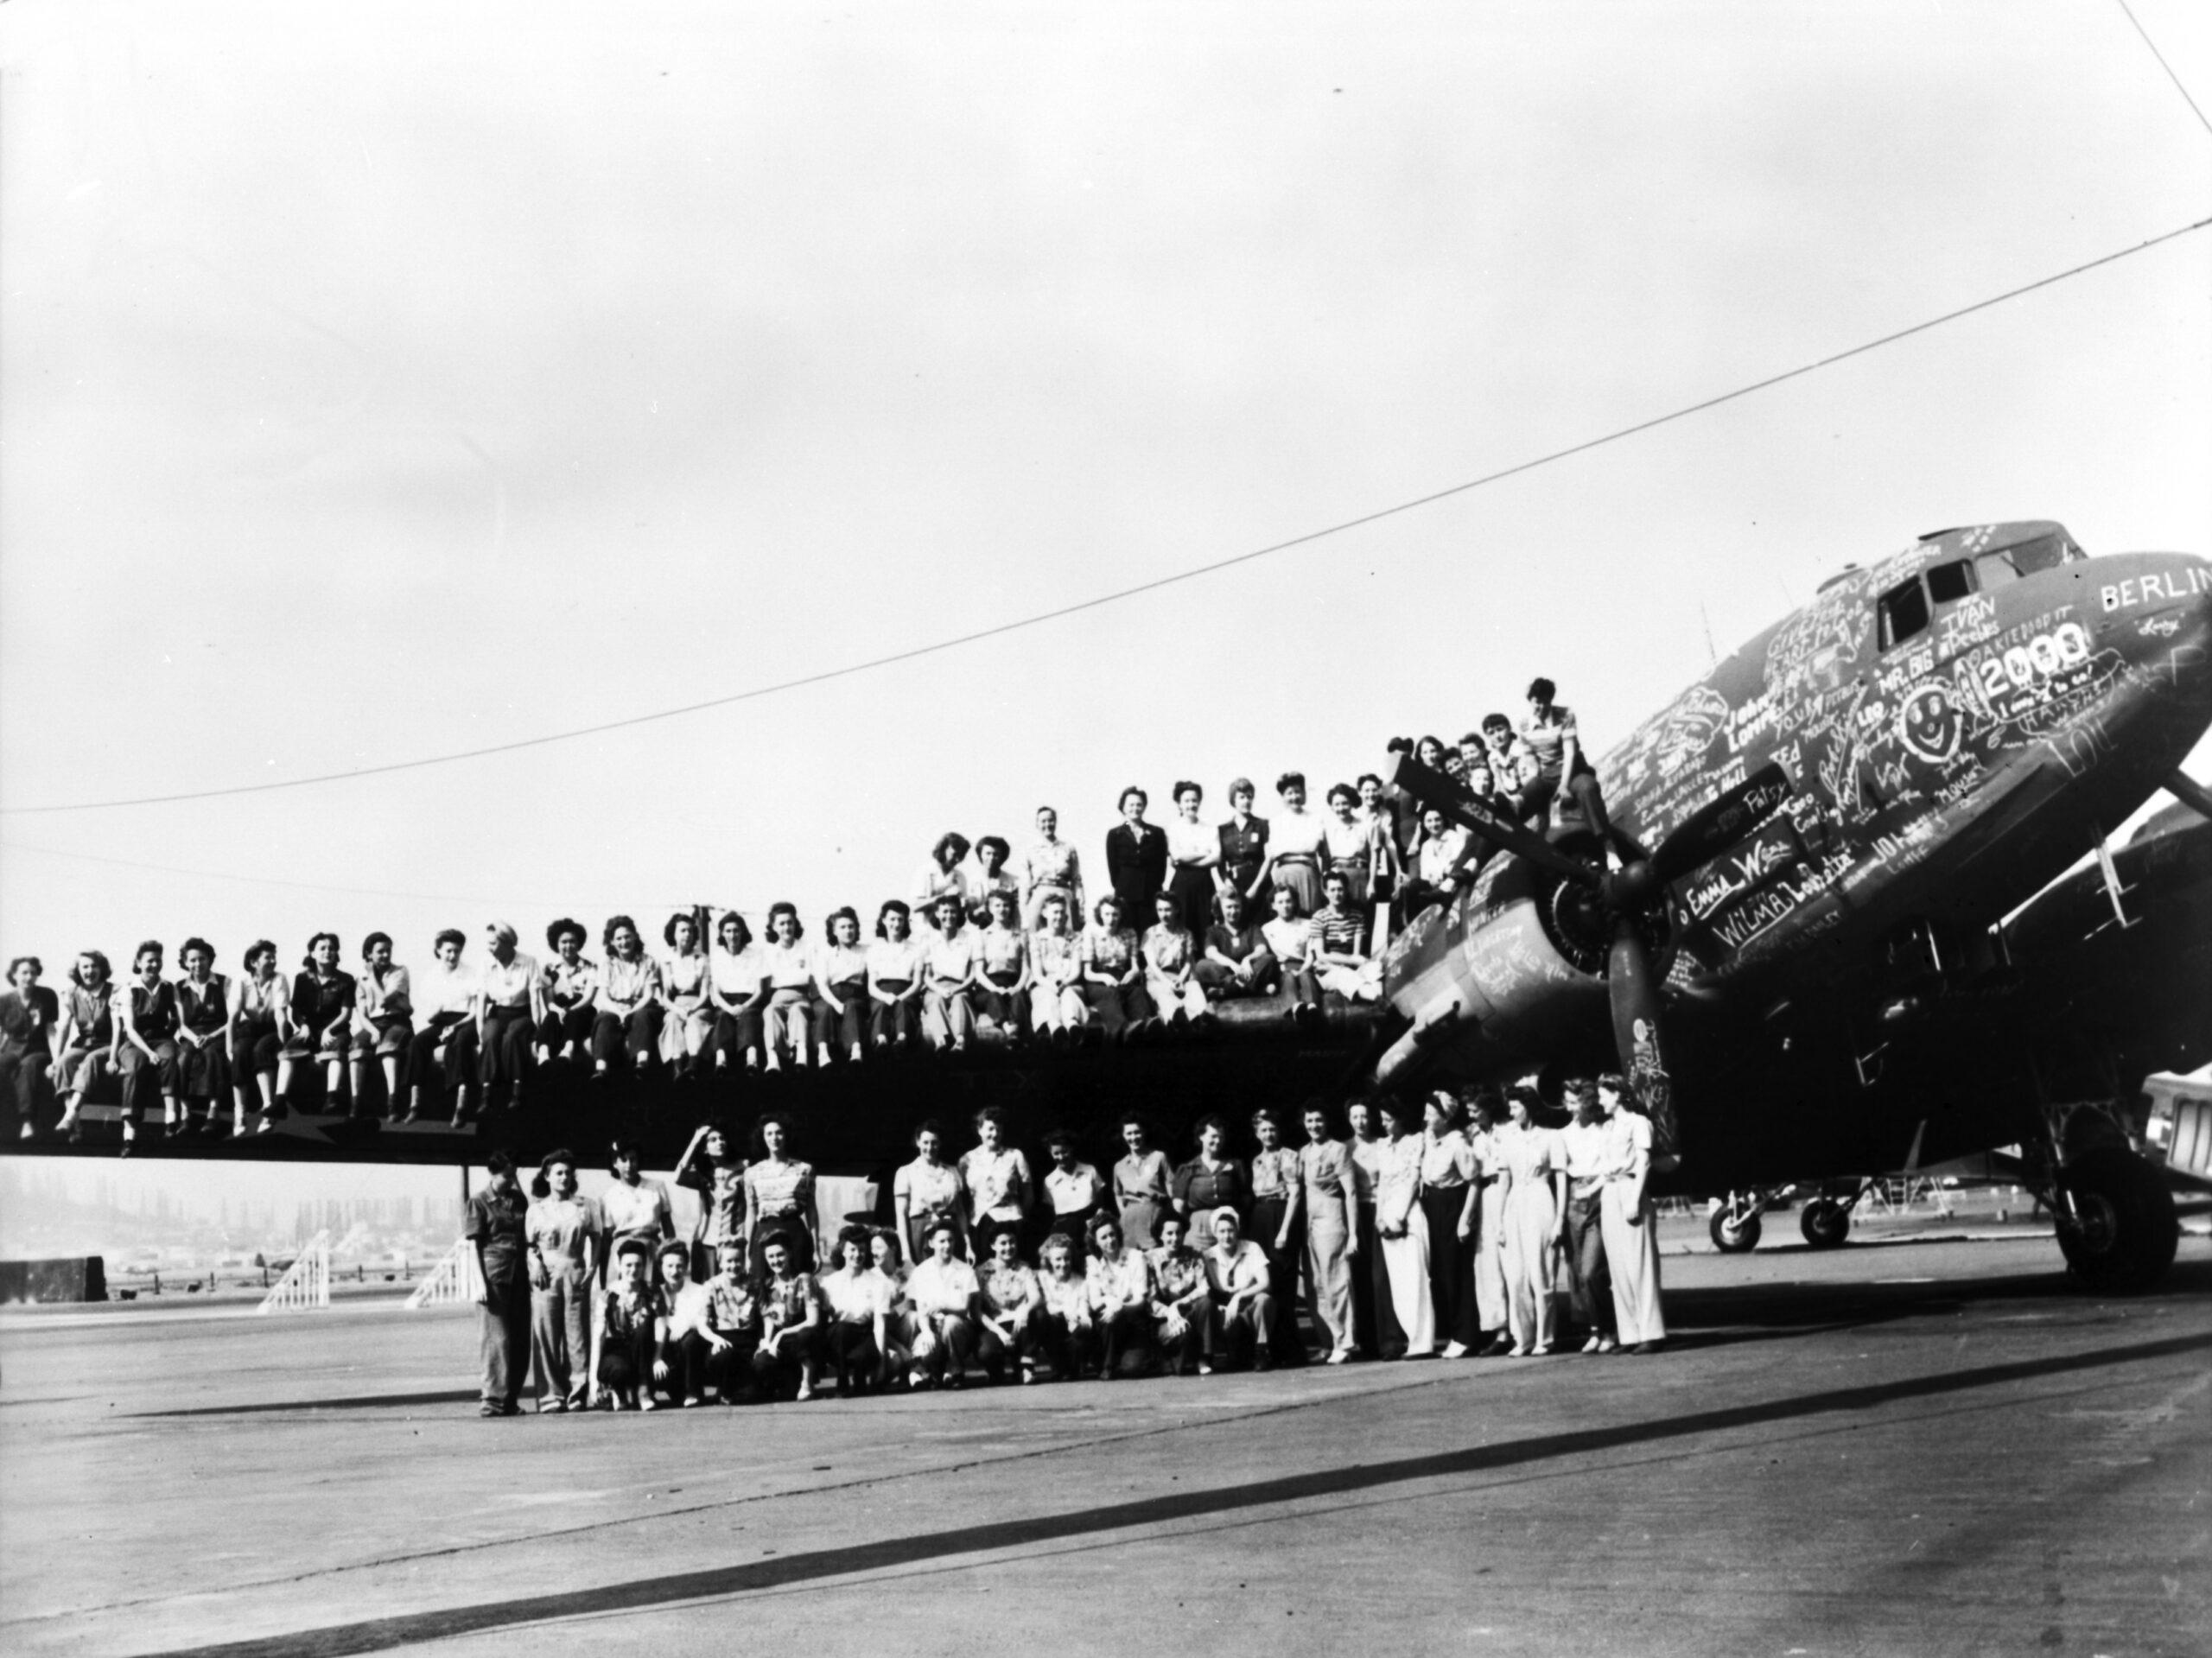 Douglas crew sitting on airplane wing